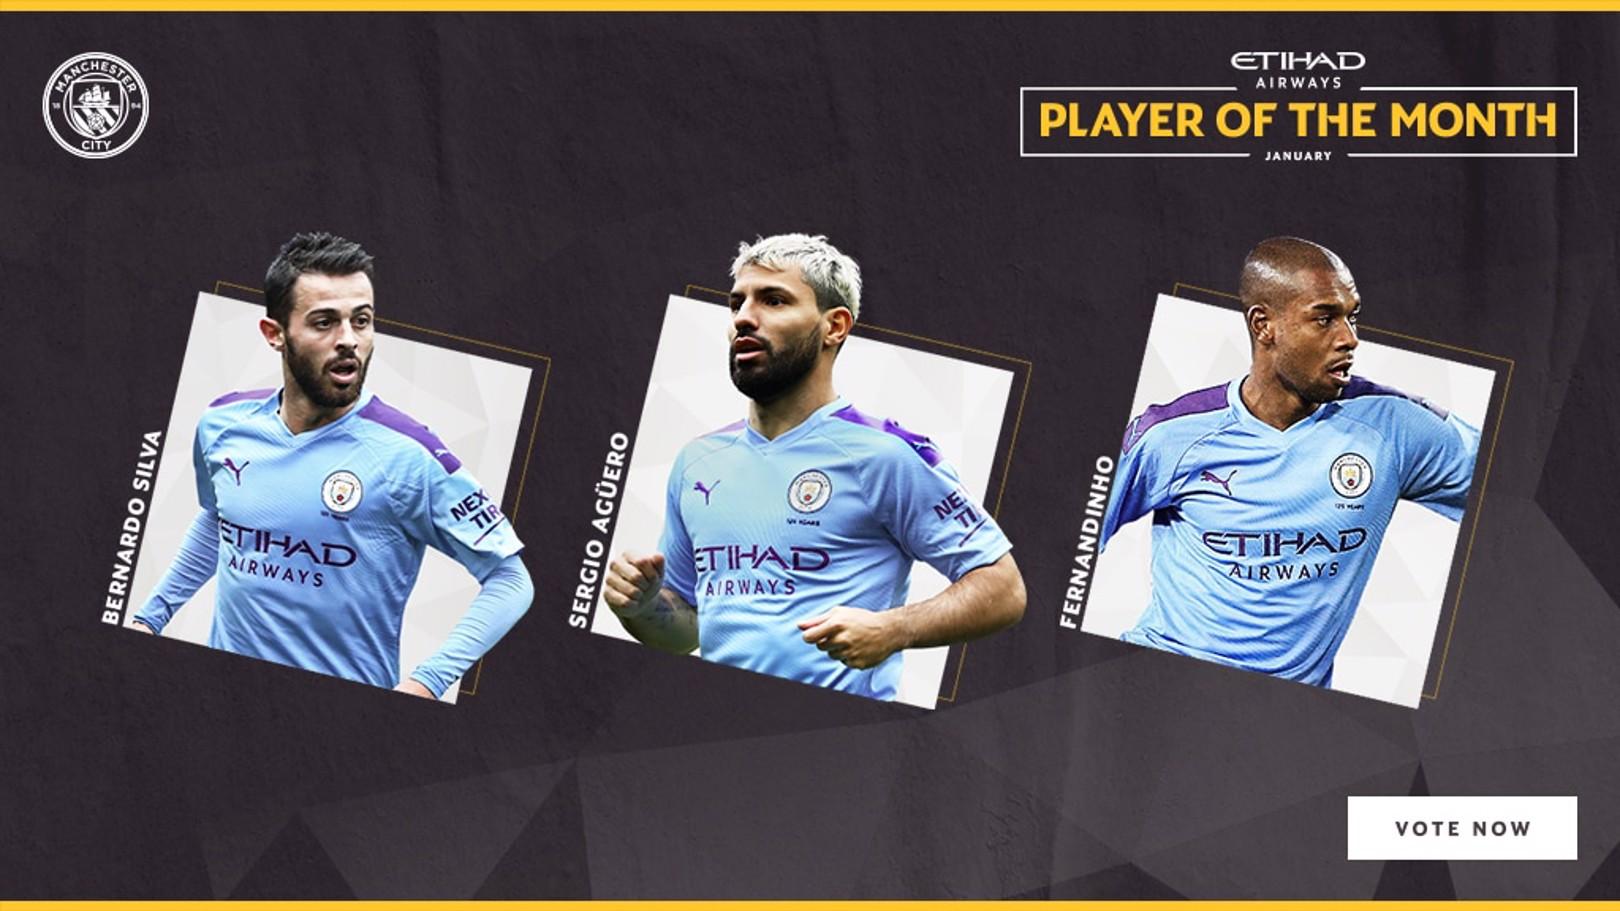 NOMINEES: Sergio Aguero, Fernandinho and Bernardo Silva are up for January's Etihad Player of the Month.